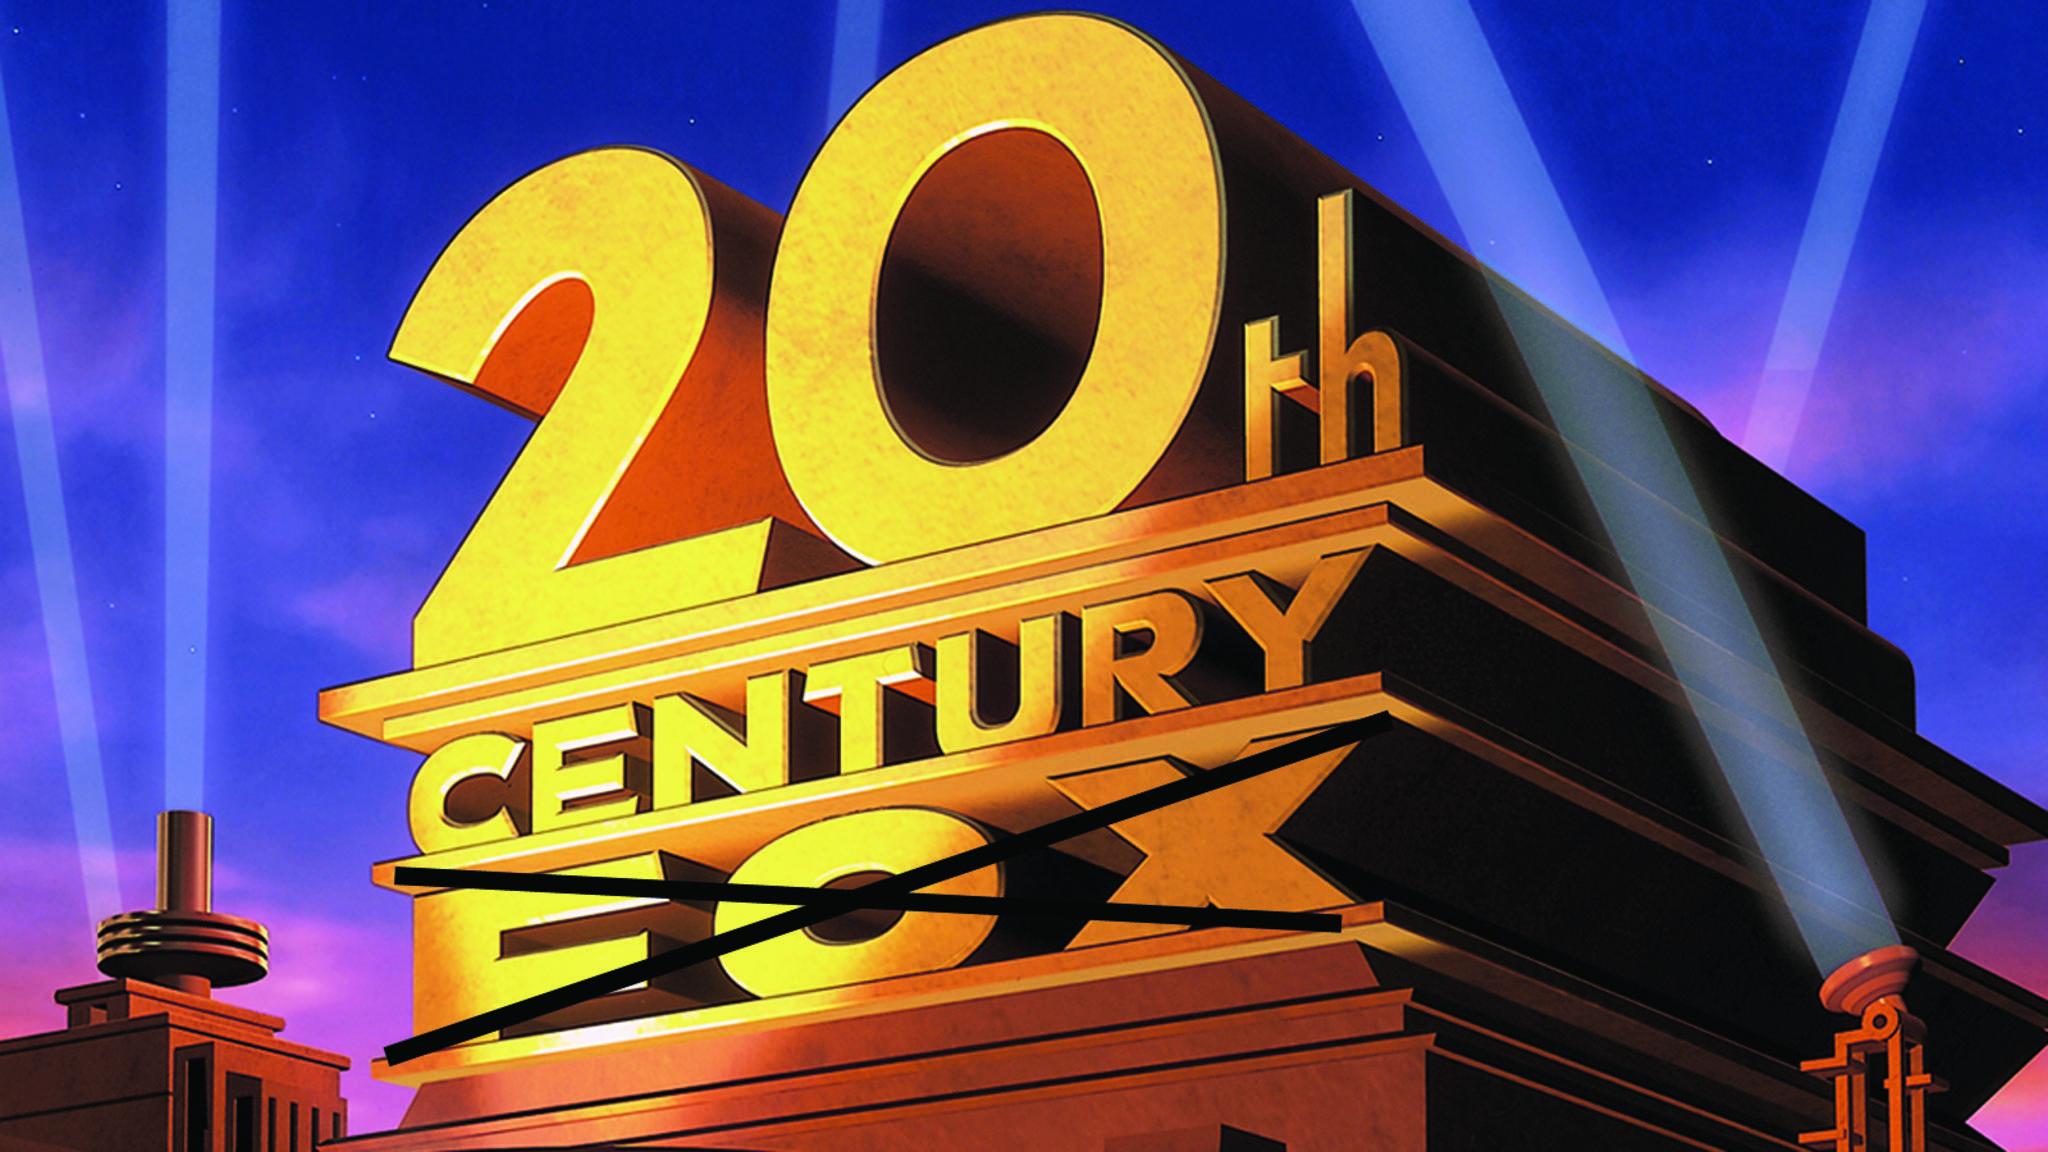 Twentieth Century ohne Fox